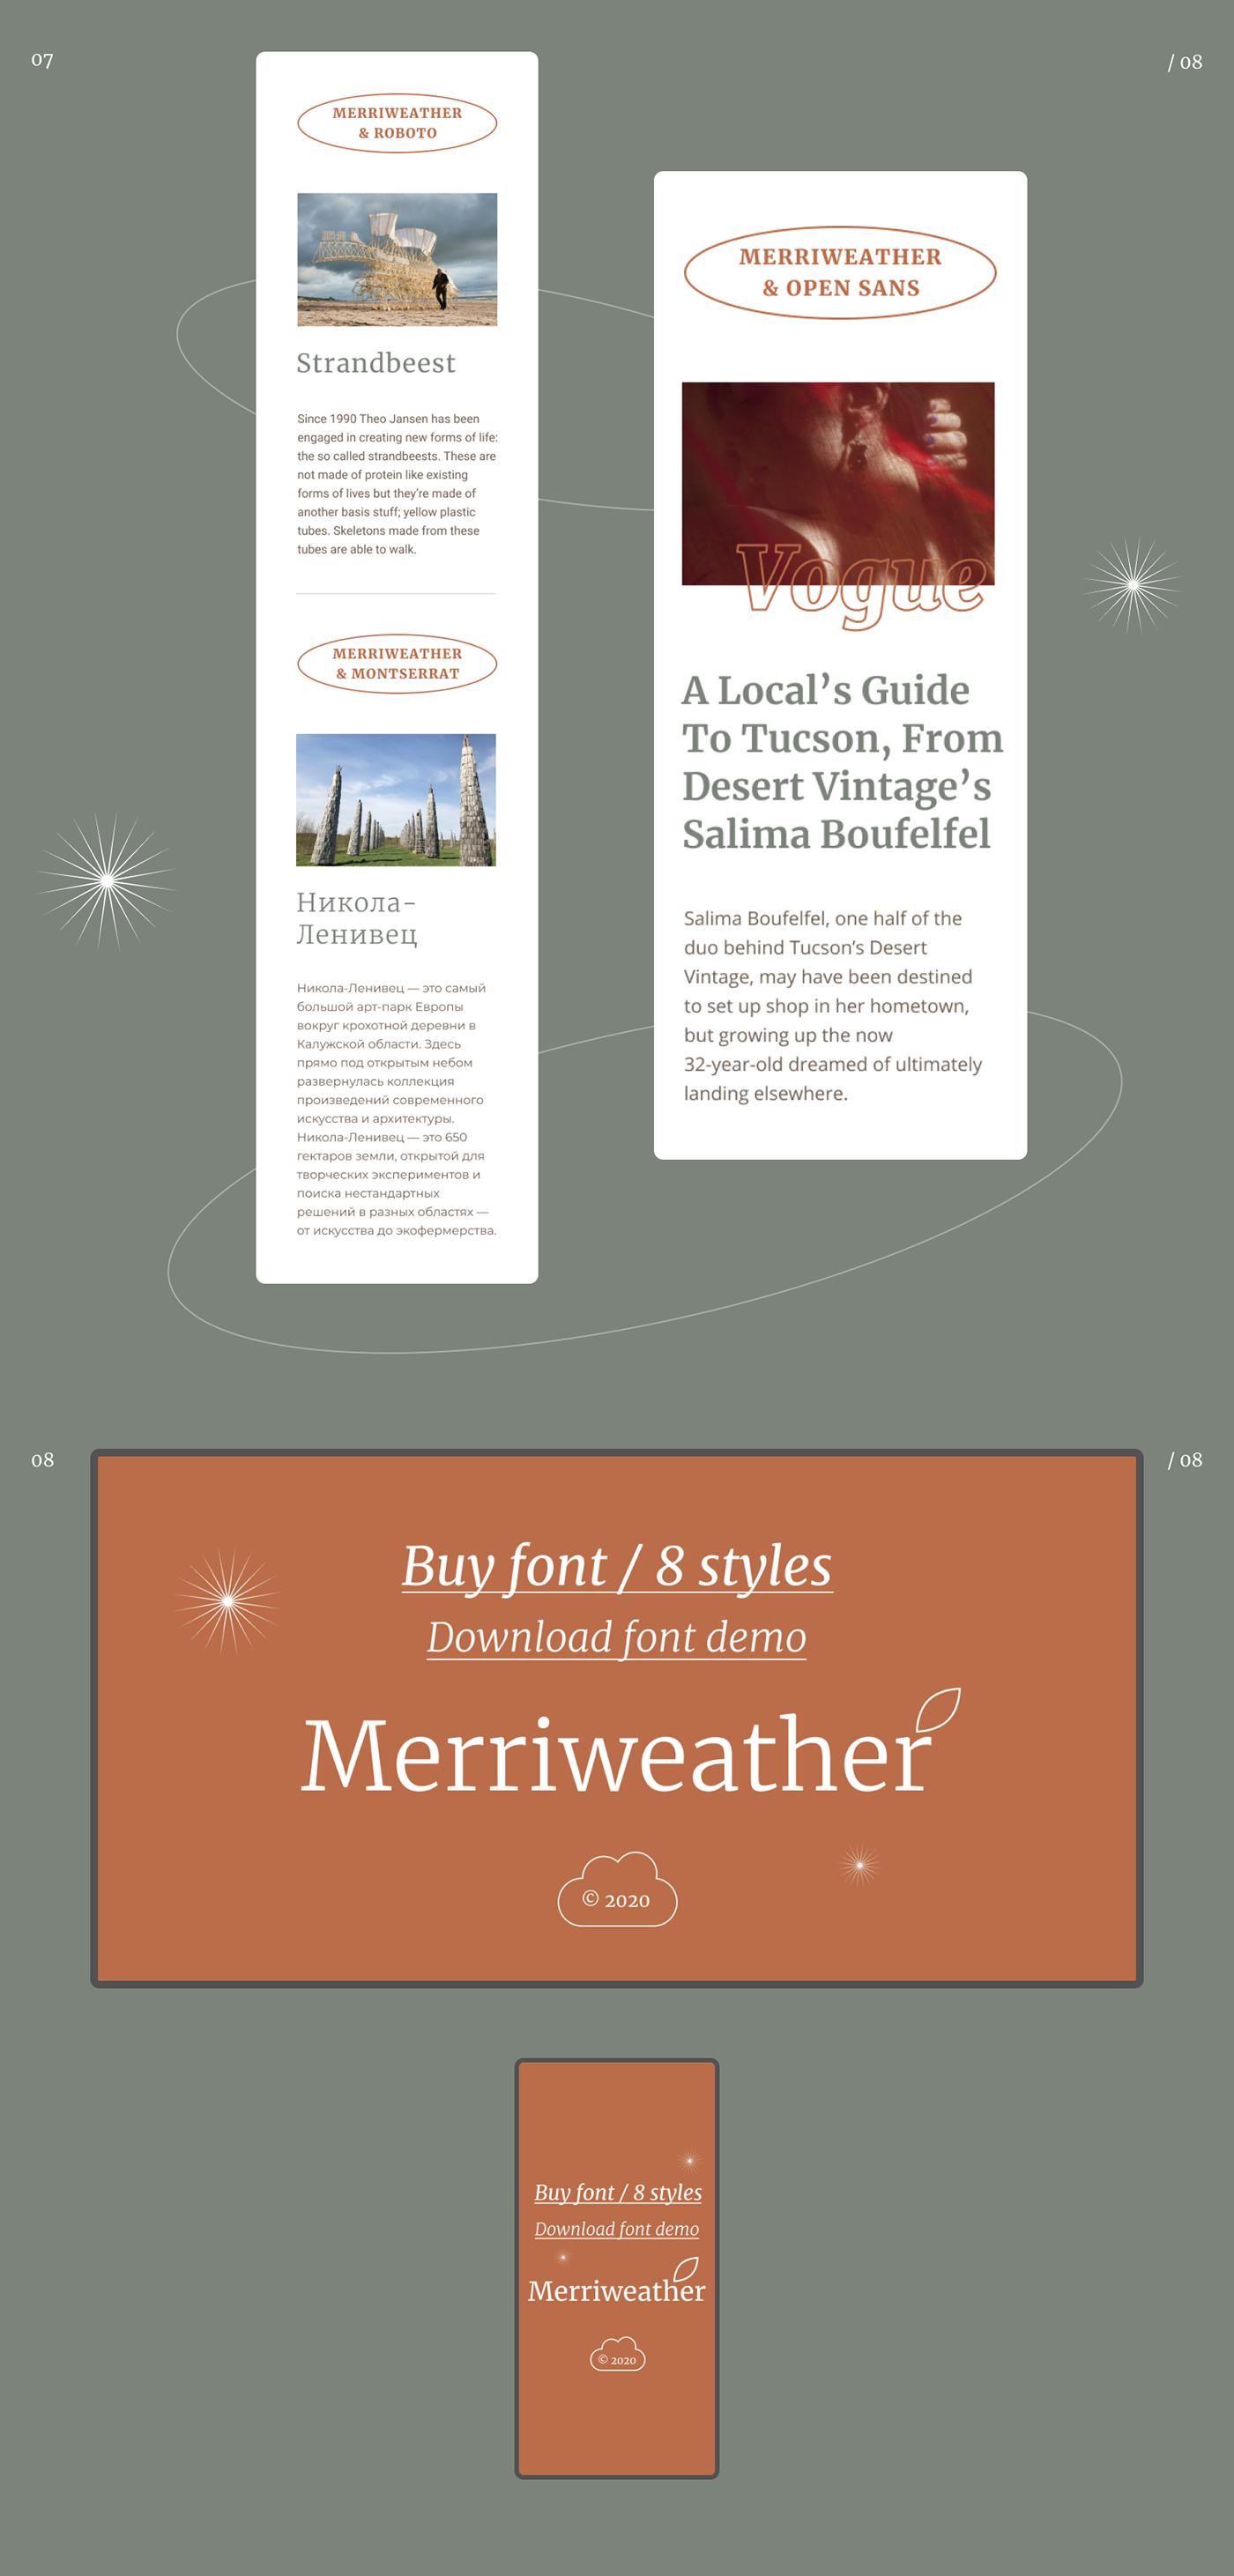 font font website Google Font Merriweather merriweather font typography   web site